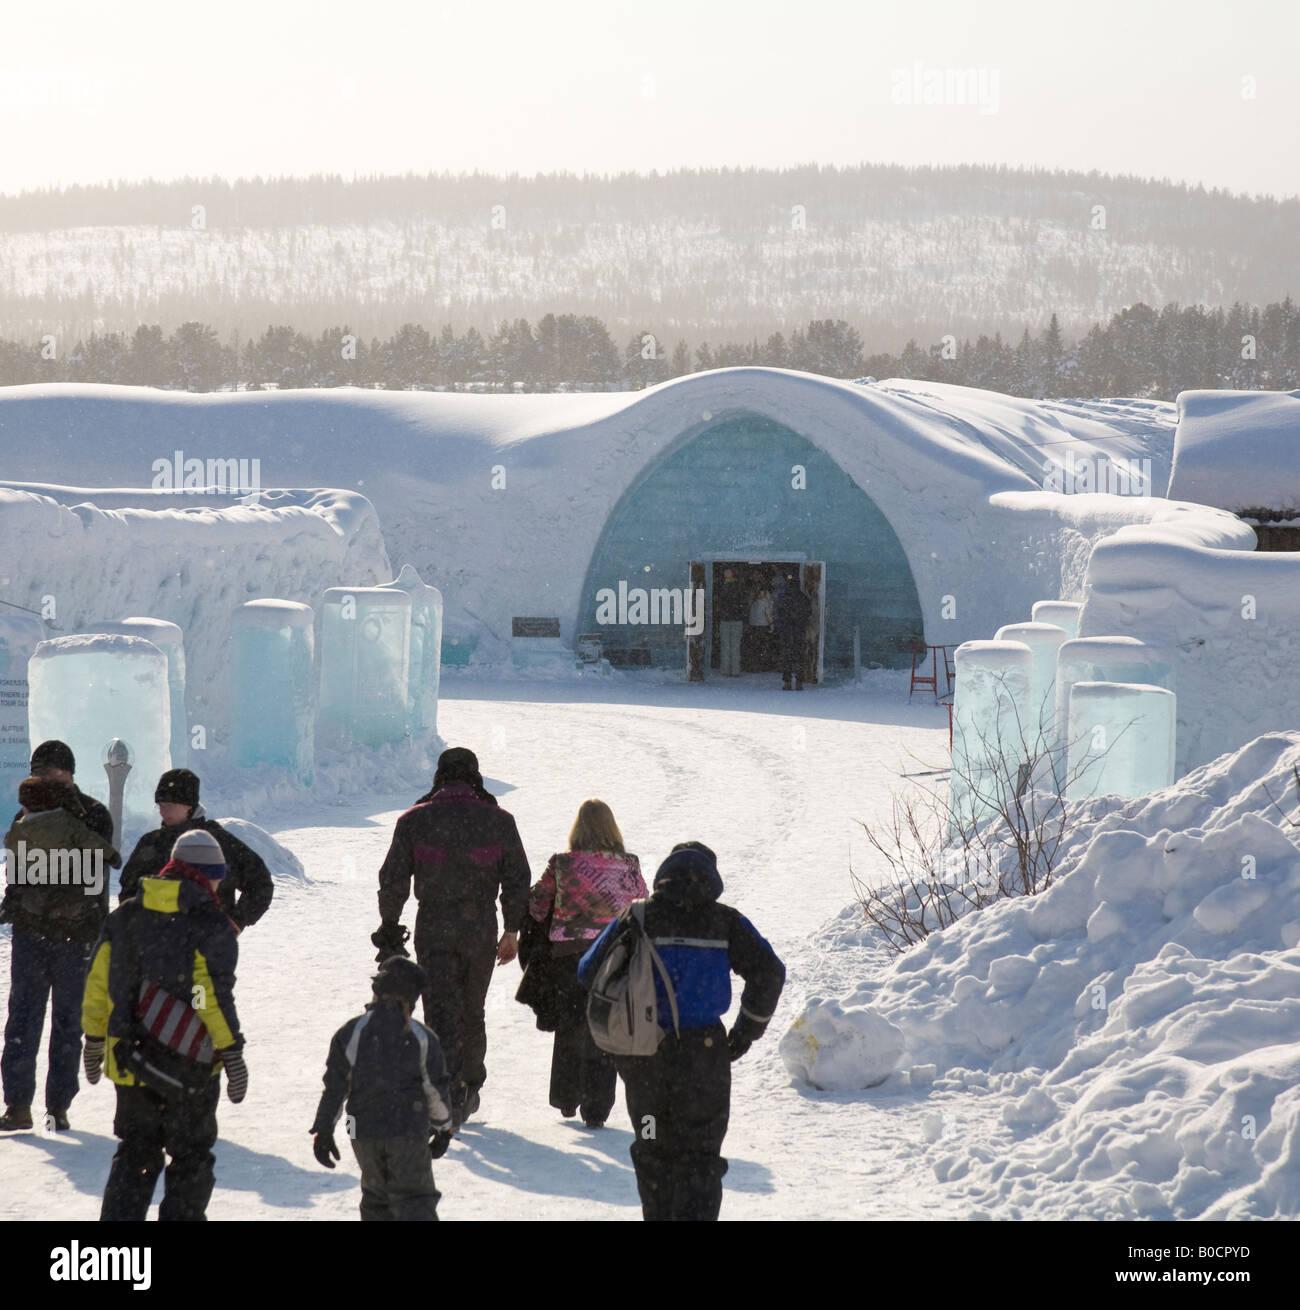 Visitors walk towards the Jukkasjarvi icehotel in northern Sweden - Stock Image